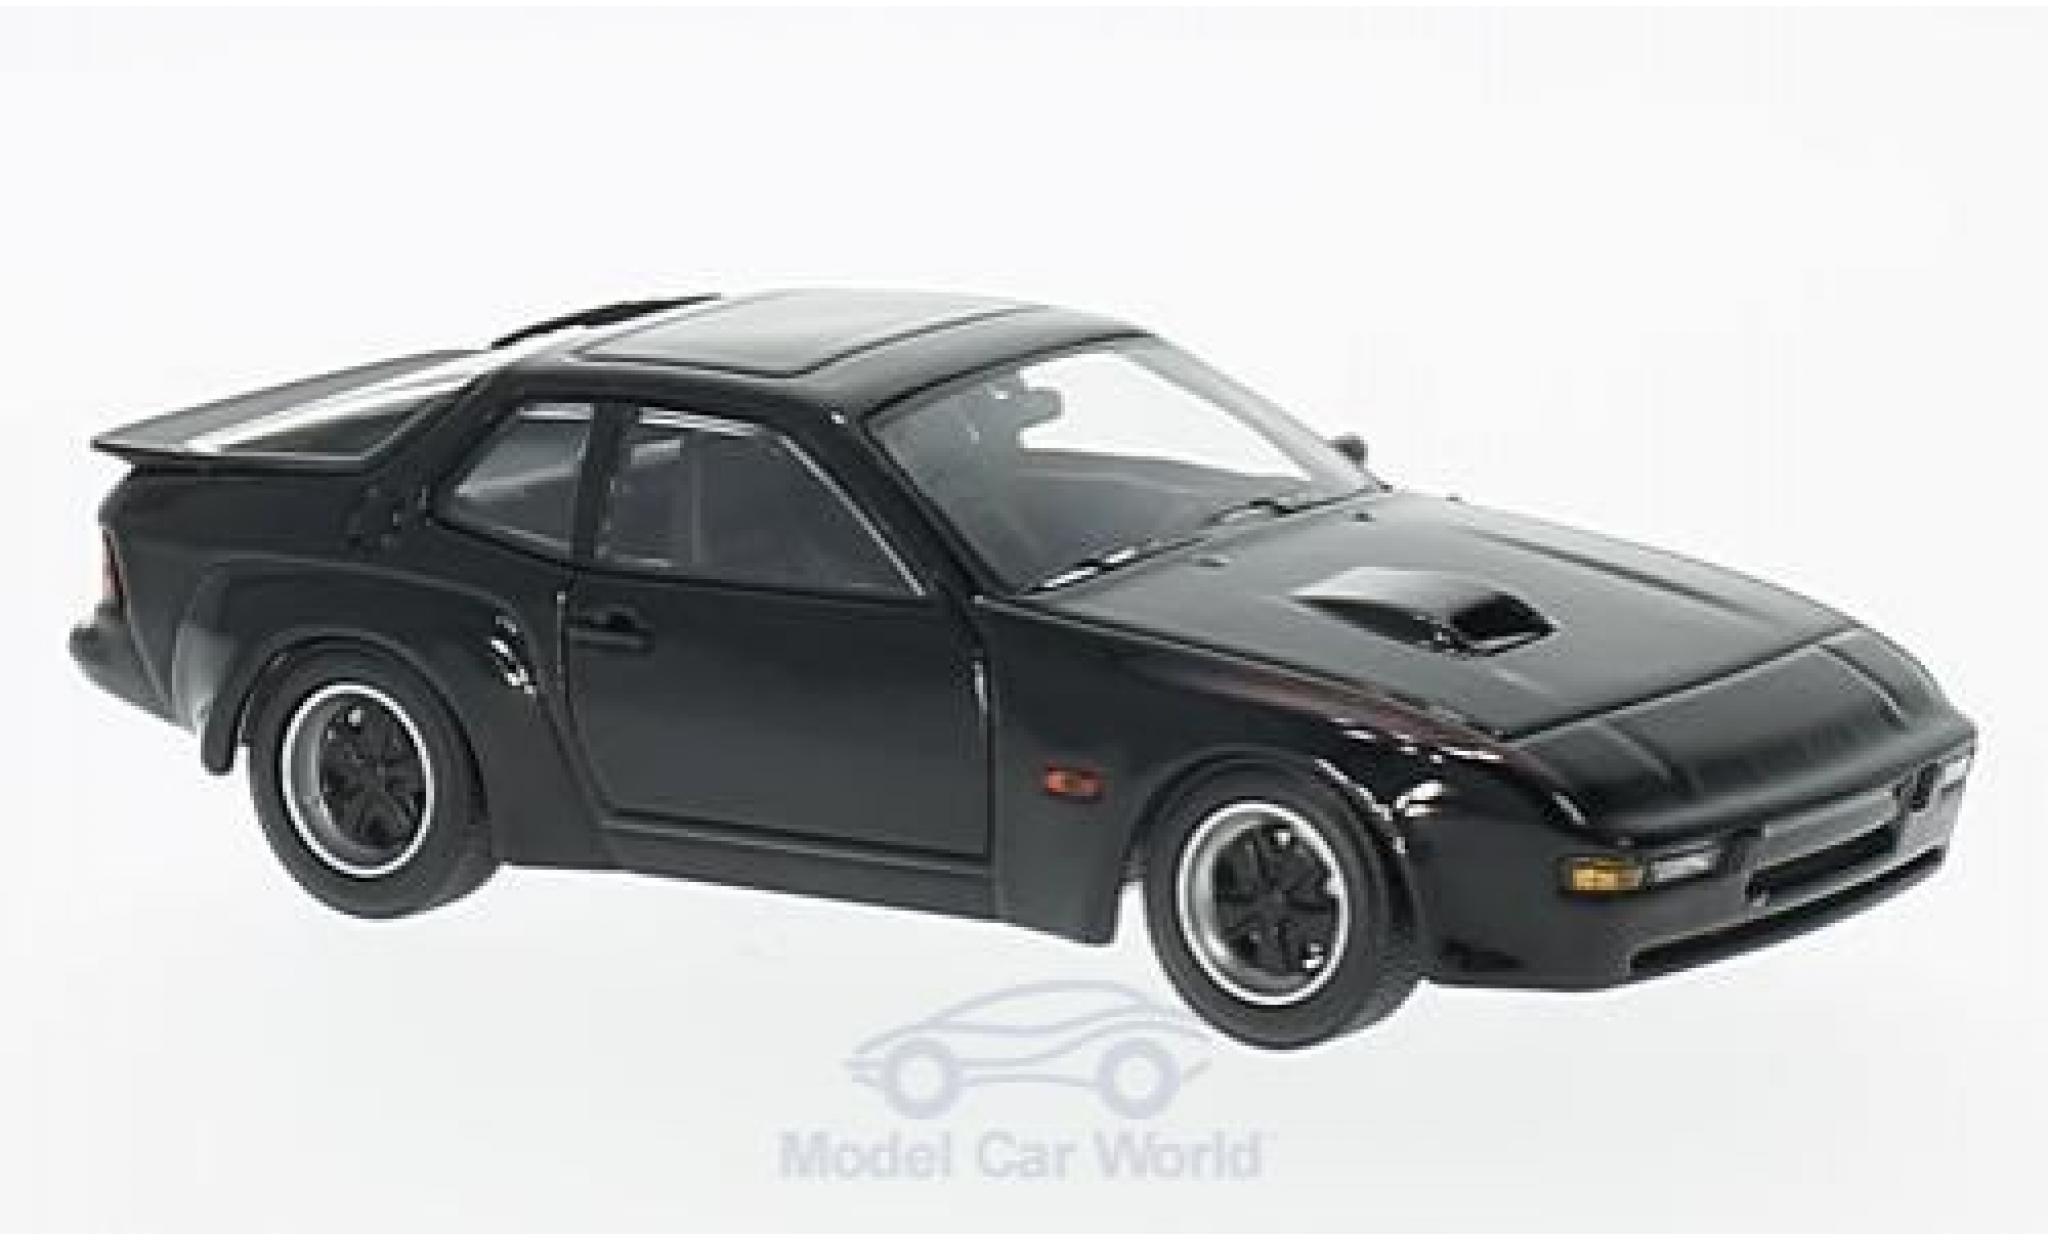 Porsche 924 1/43 Maxichamps Carrera GT noire 1981